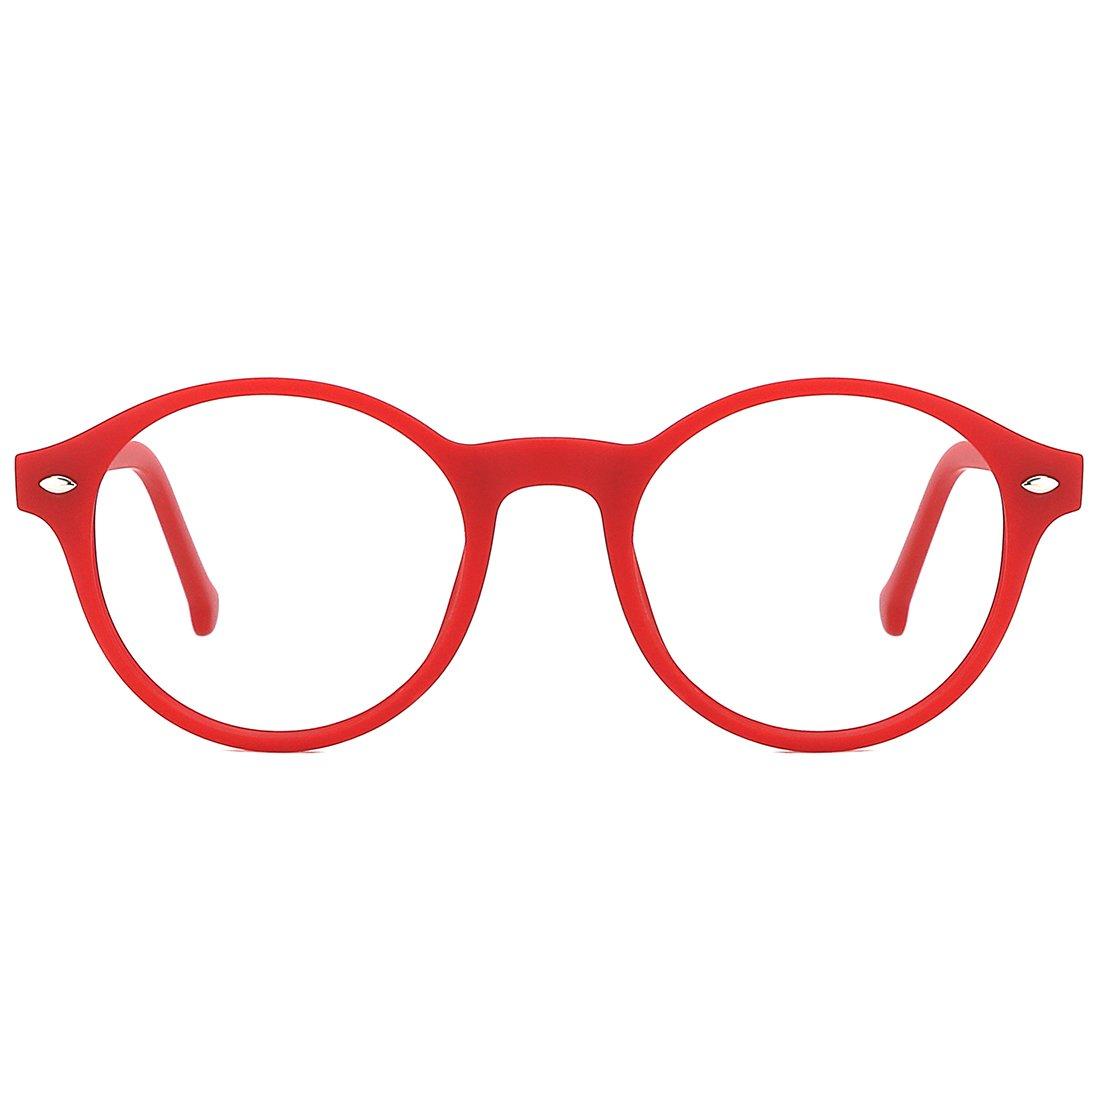 TIJN Men Women Classic Round Non-prescription Glasses Frosted Eyeglasses Frames 00064201